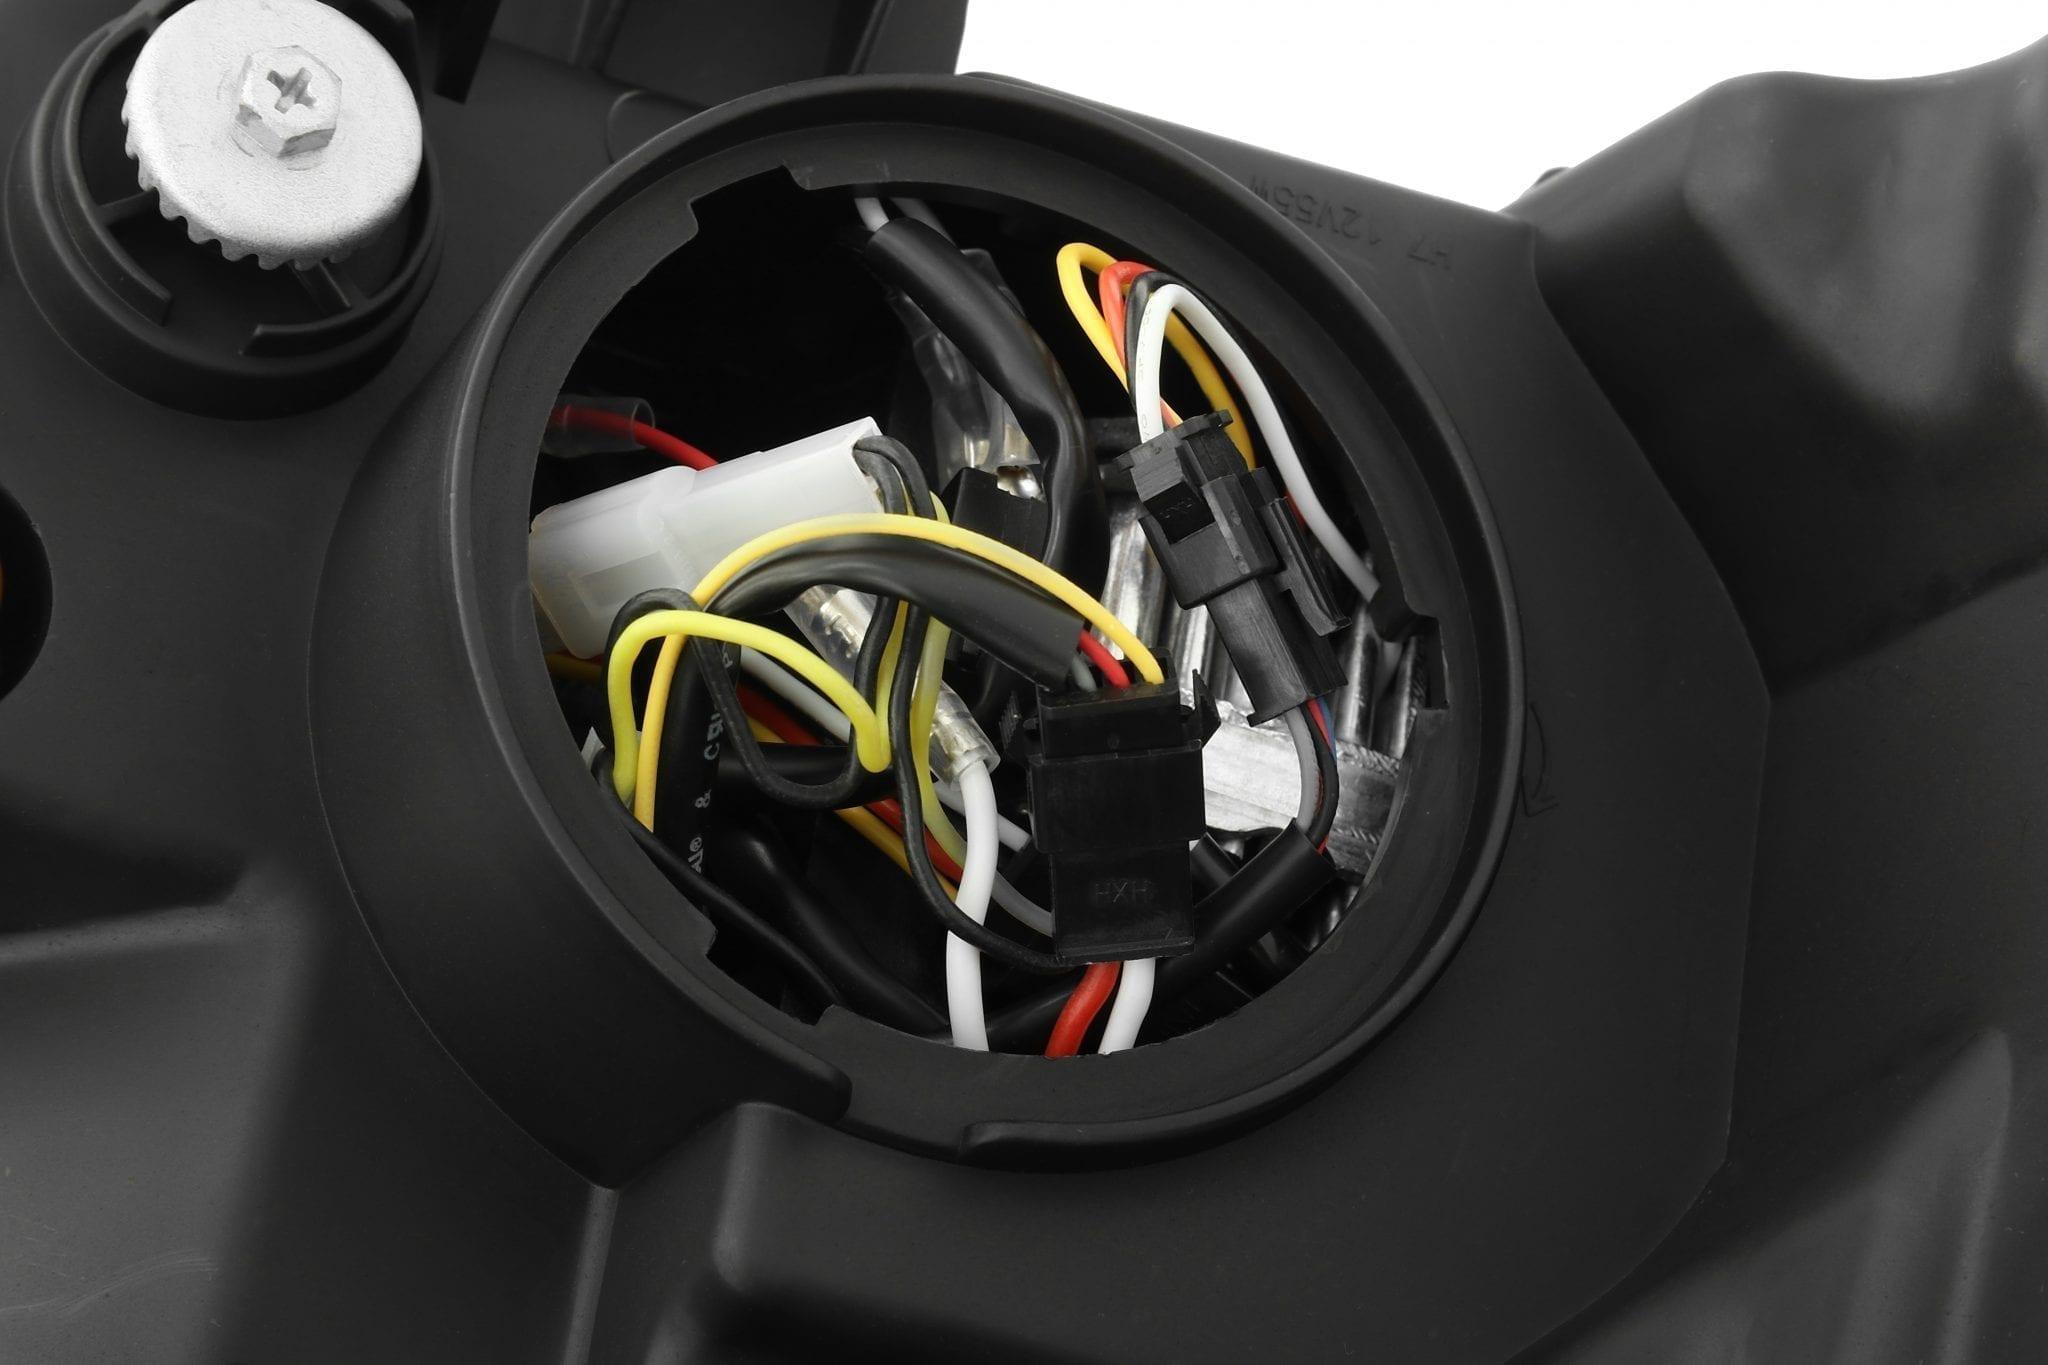 AlphaRex 2007 2008 2009 2010 2011 2012 2013 Chevrolet Silverado NOVA-Series Full LED Projector Headlights